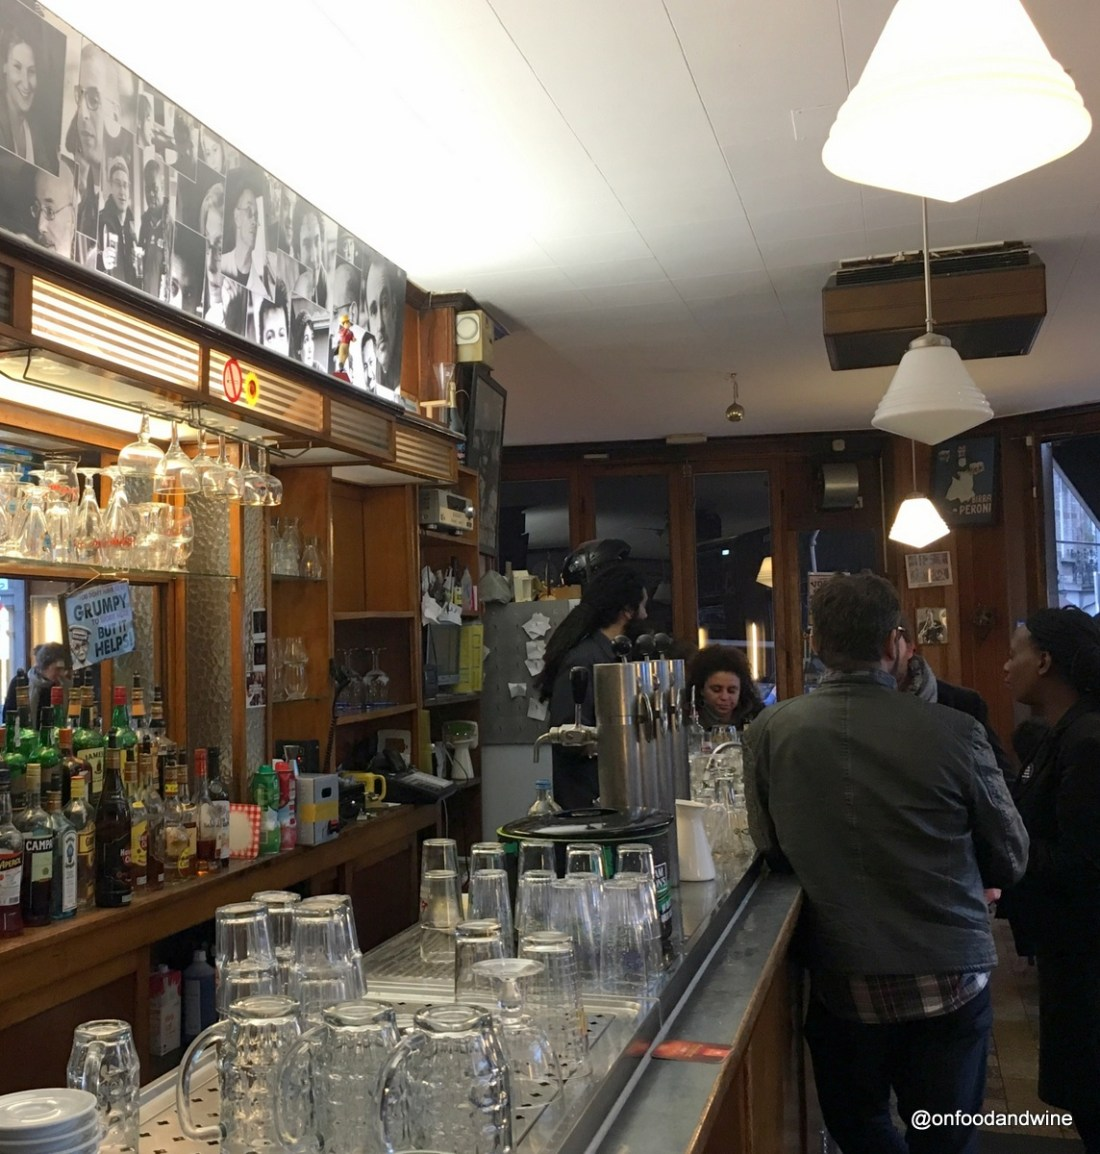 drinking Belgian #beer at Bar de l'Union in #brussels cc @visitBrussels